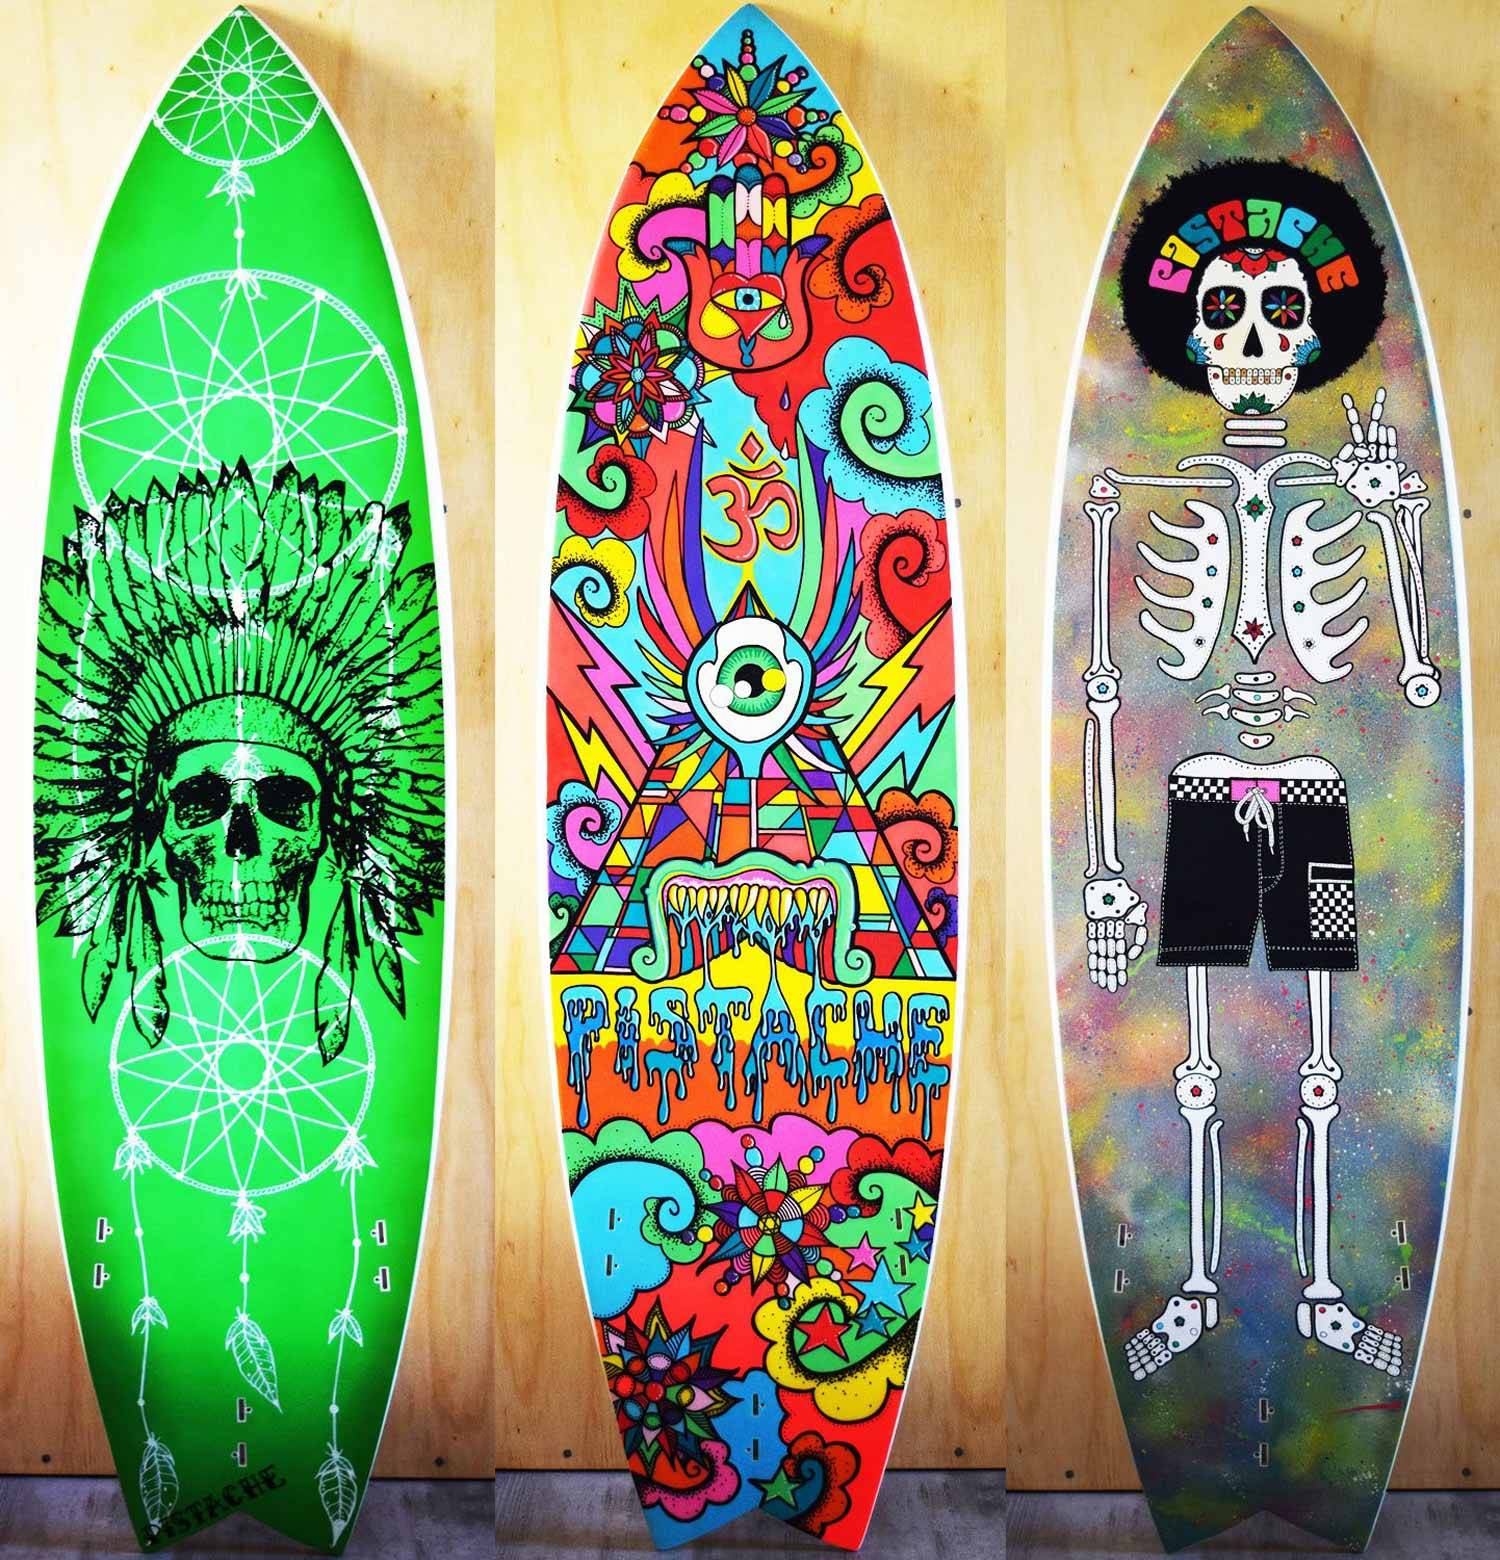 Win Surf Art by Pistache Artists